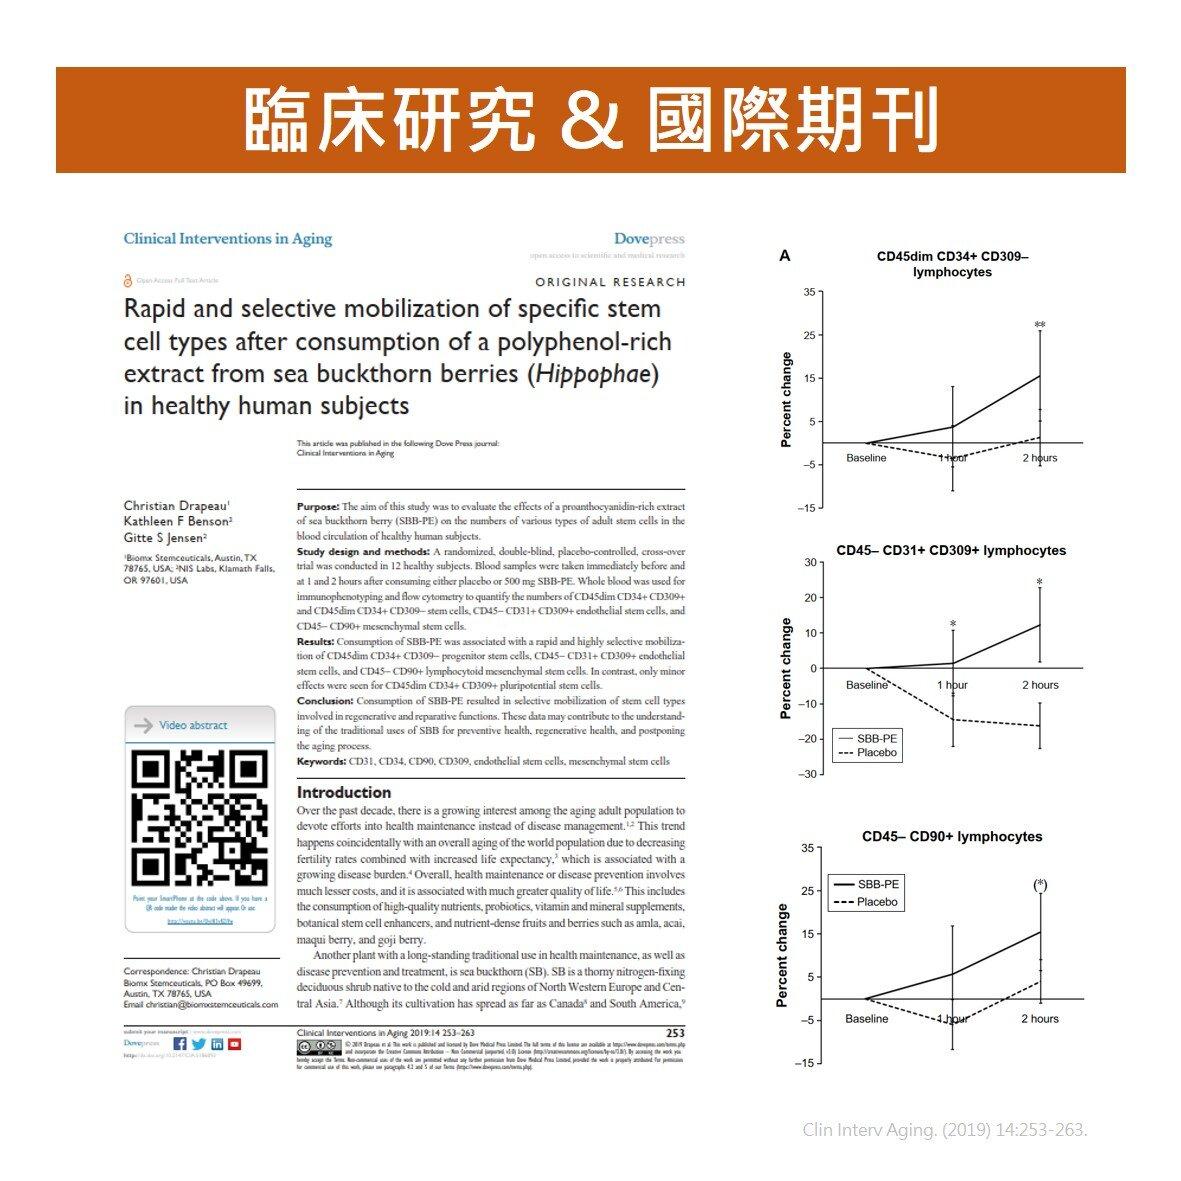 CyanthOx 沙棘籽萃取物經過臨床實證,能夠促進 CD34+ 三大幹細胞活化